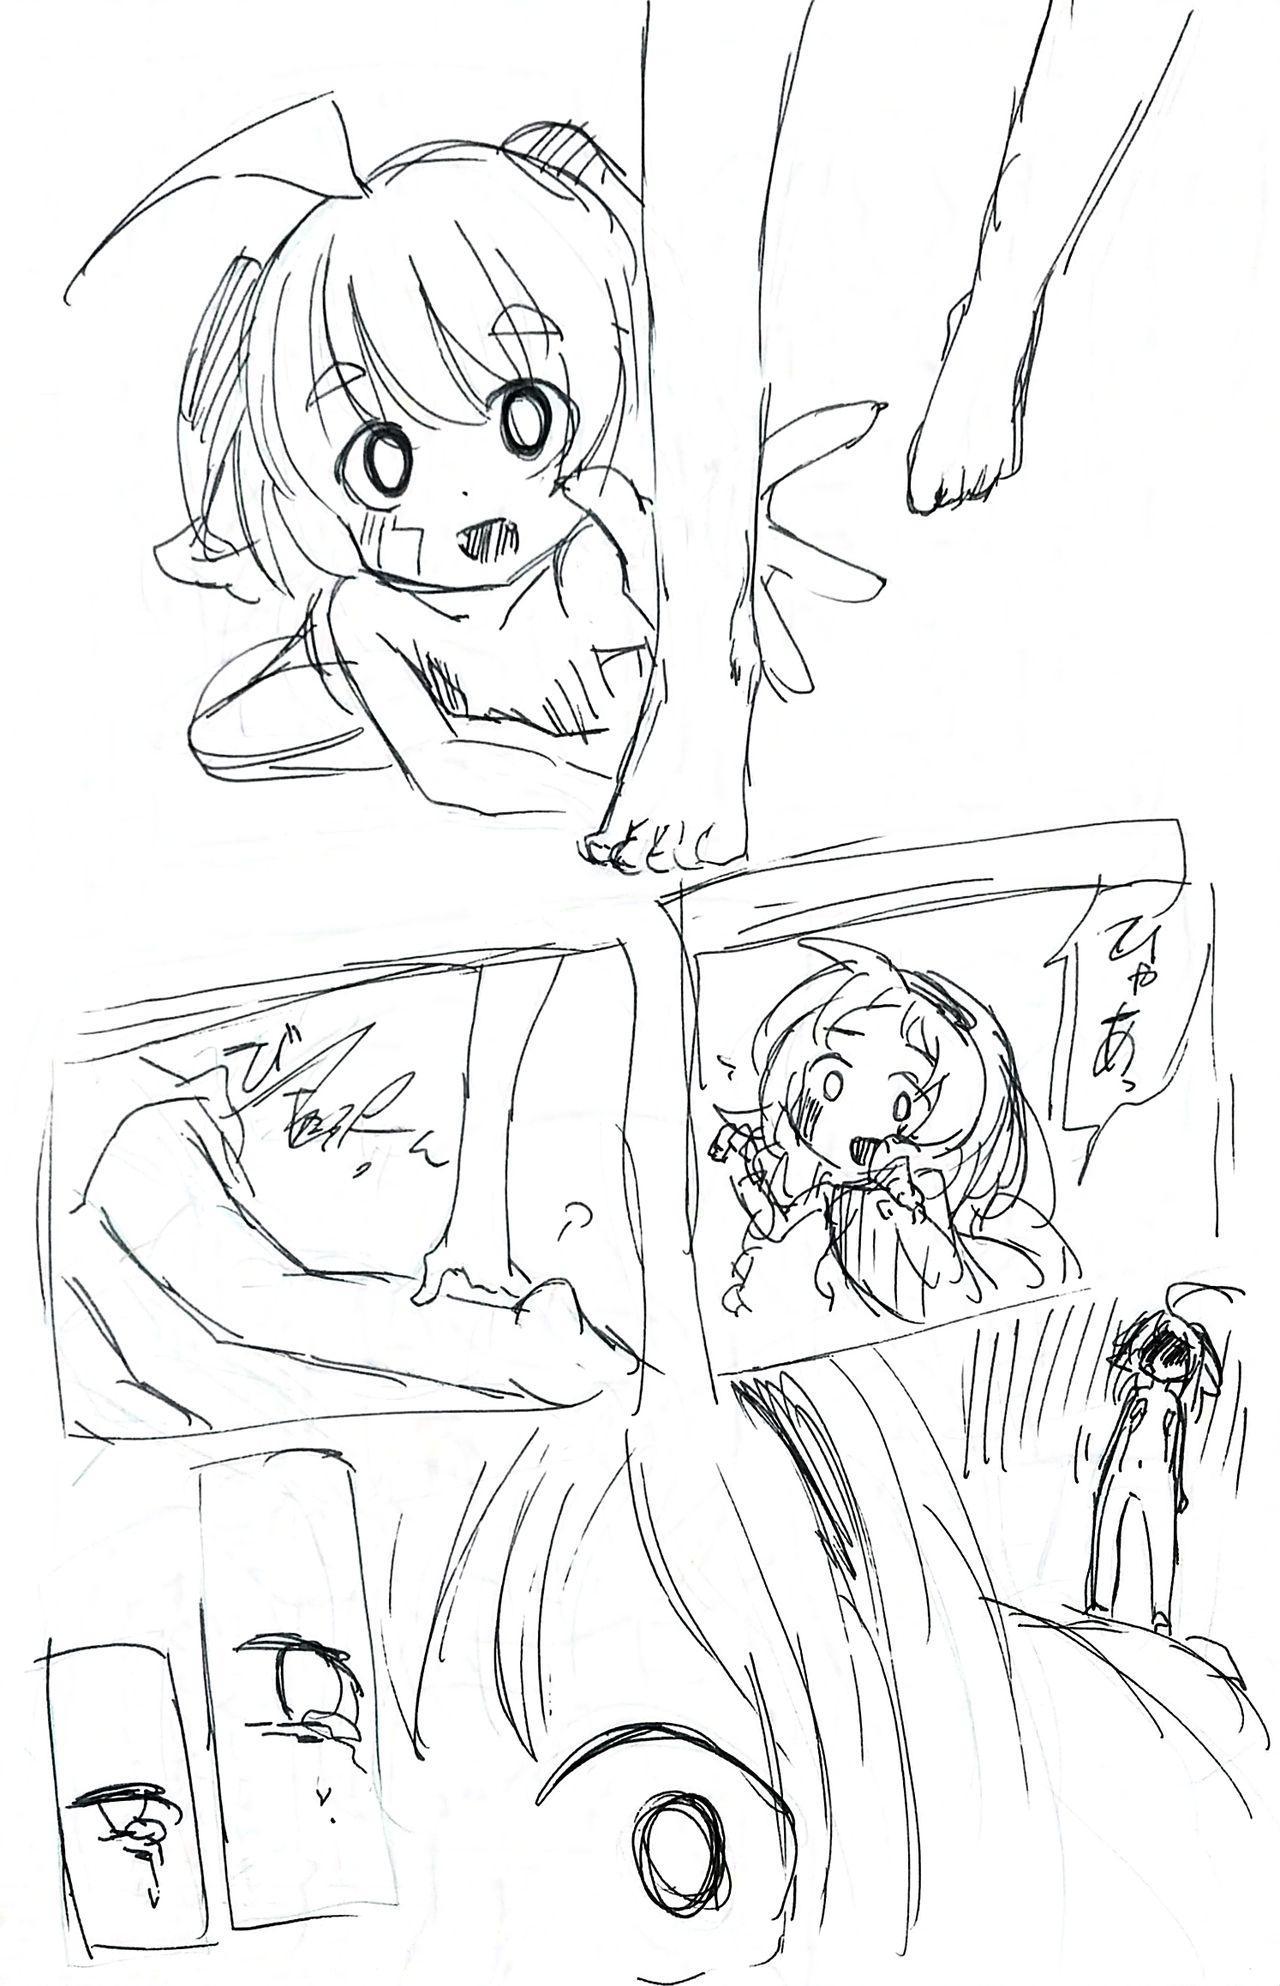 Hisui-chan carnival biyori 5